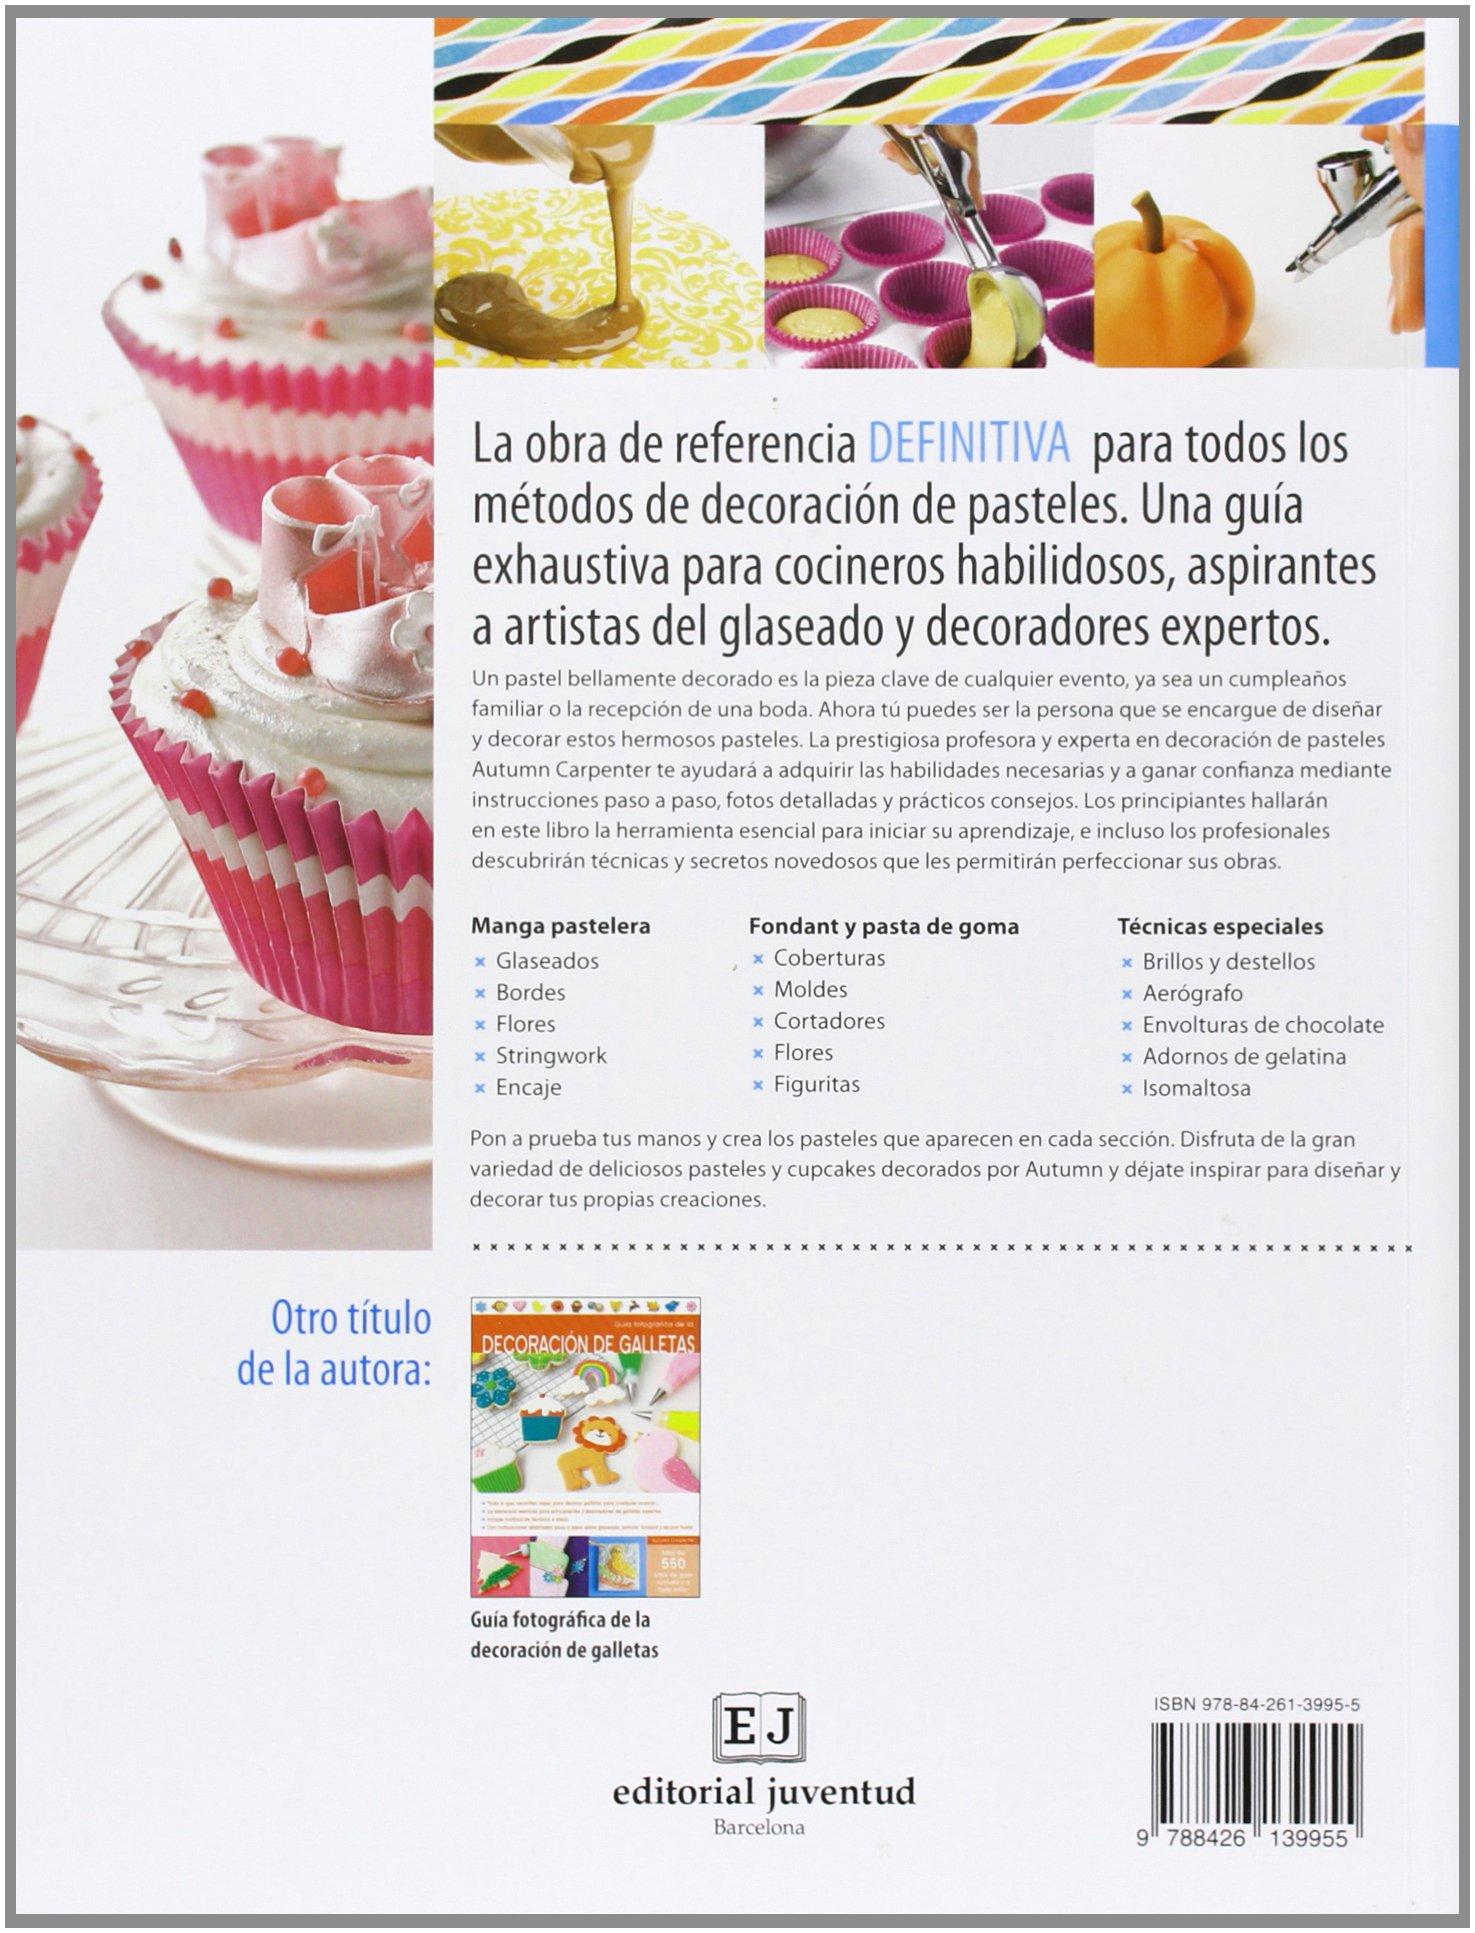 Guía fotográfica de decoración de pasteles REPOSTERIA DE DISEÑO: Amazon.es: Autumn Carpenter: Libros